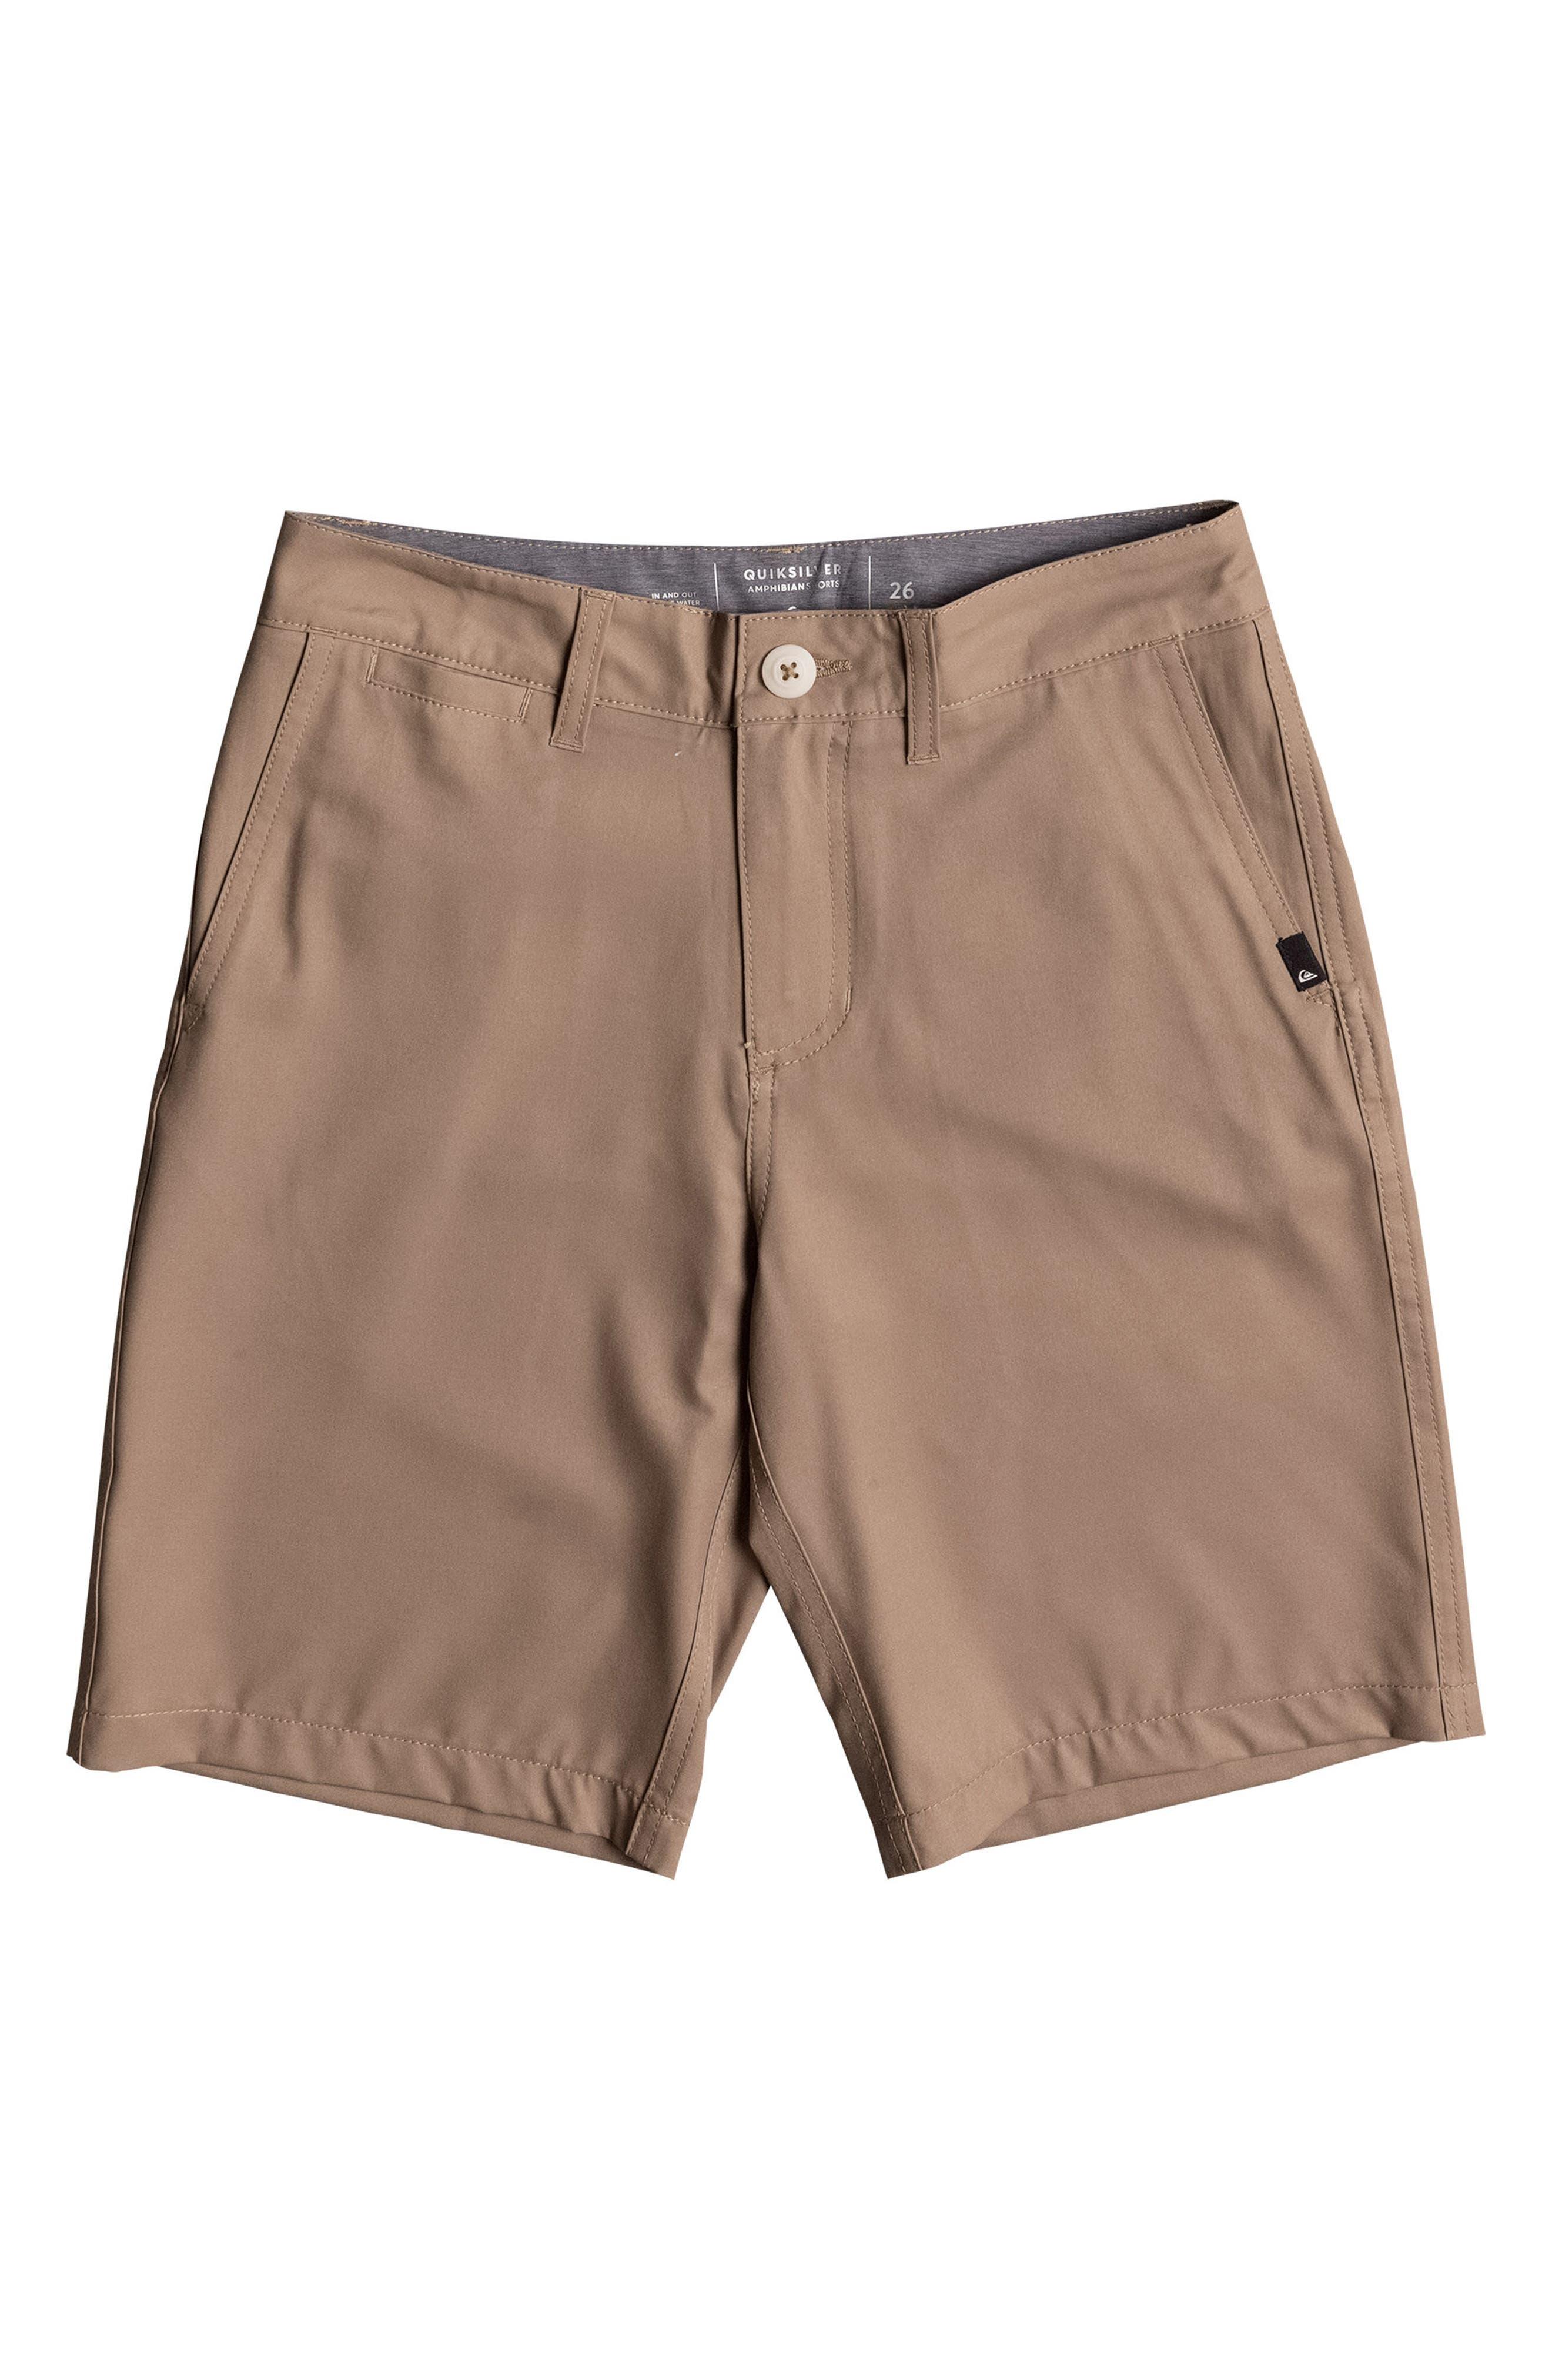 Union Amphibian Shorts,                             Main thumbnail 1, color,                             253